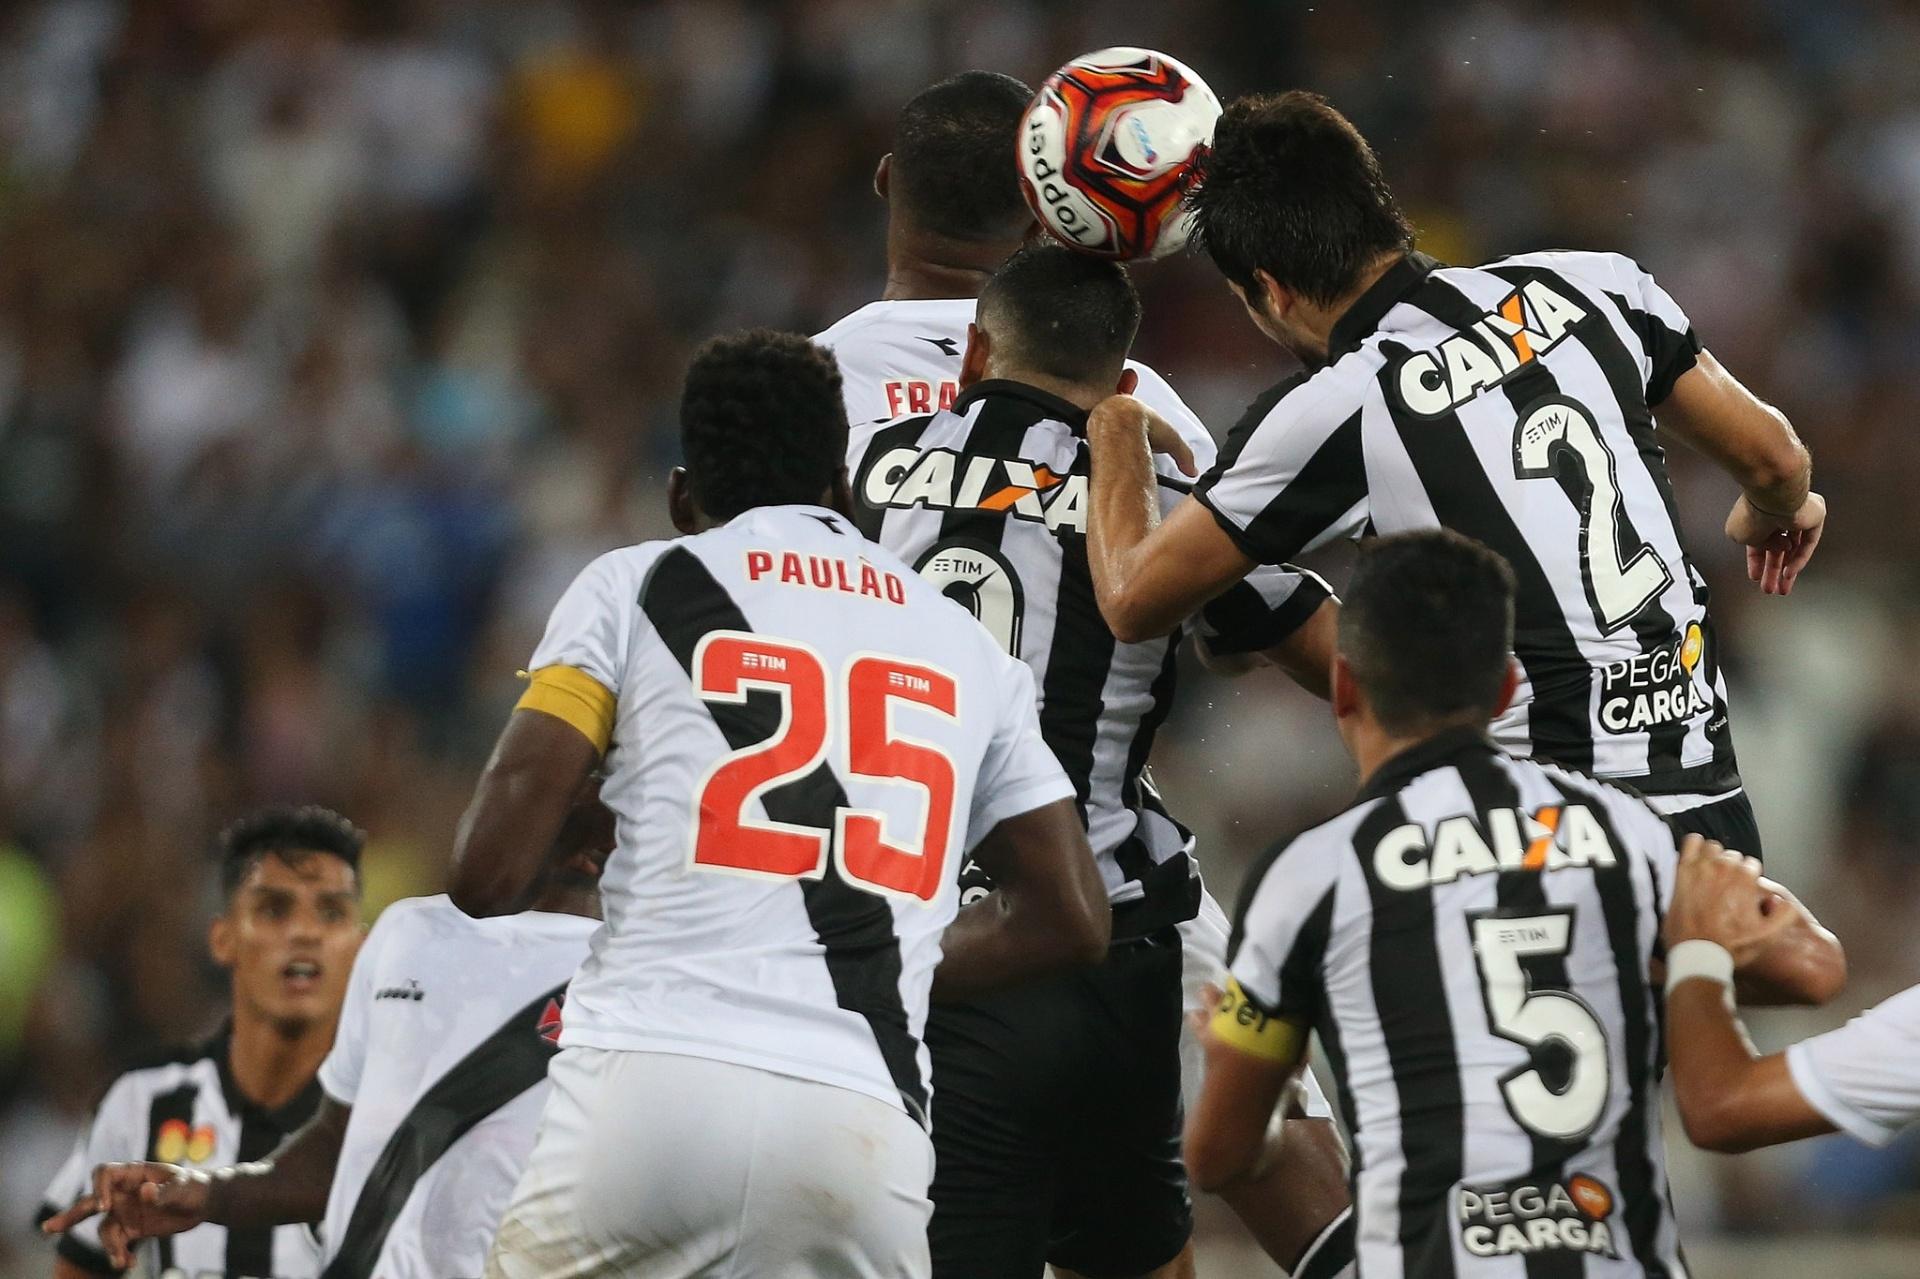 Vasco e Bota põem status à prova em nova final - 01 04 2018 - UOL Esporte 7d8696507e265